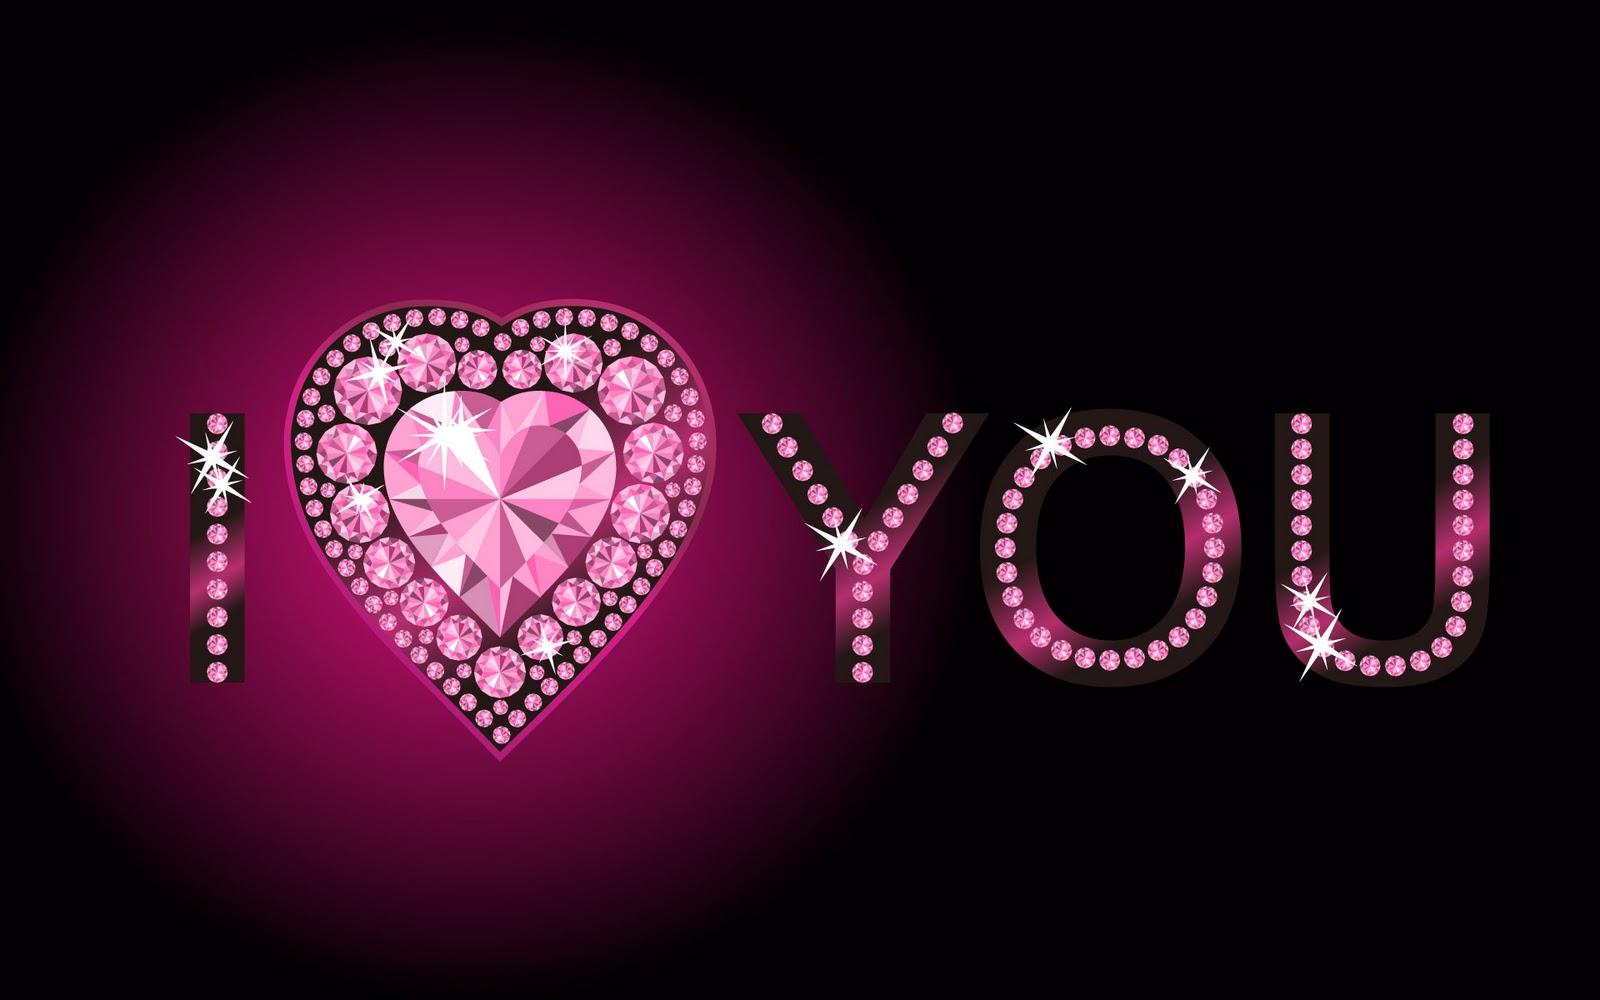 عيد الحب صور حب صور عشق Happy Valentine Day